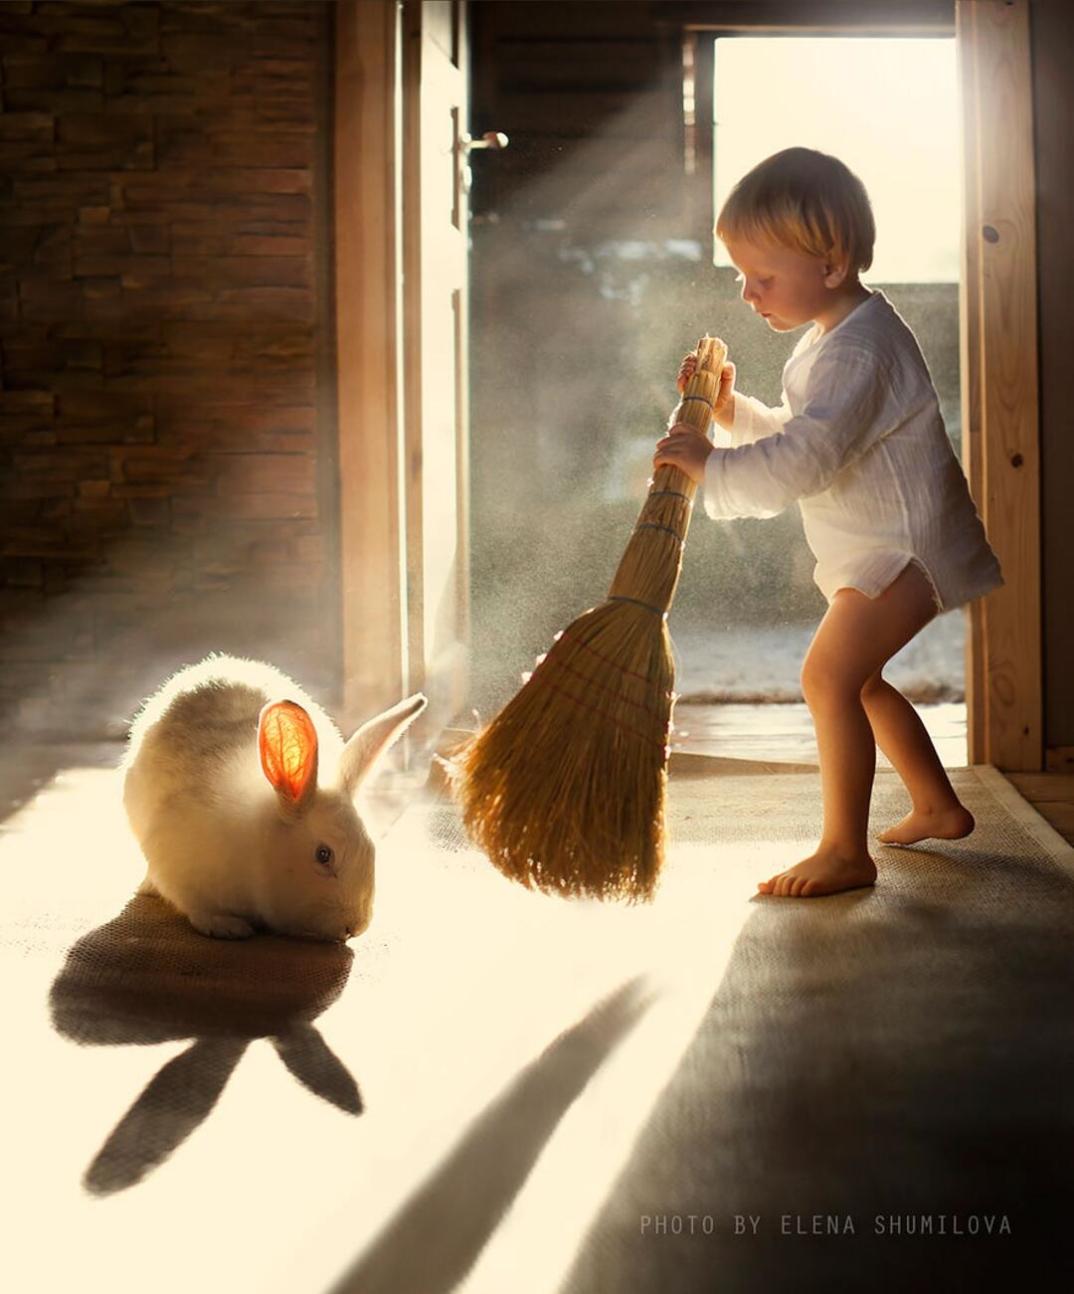 animali-bambini-fotografia-elena-shumilova-17